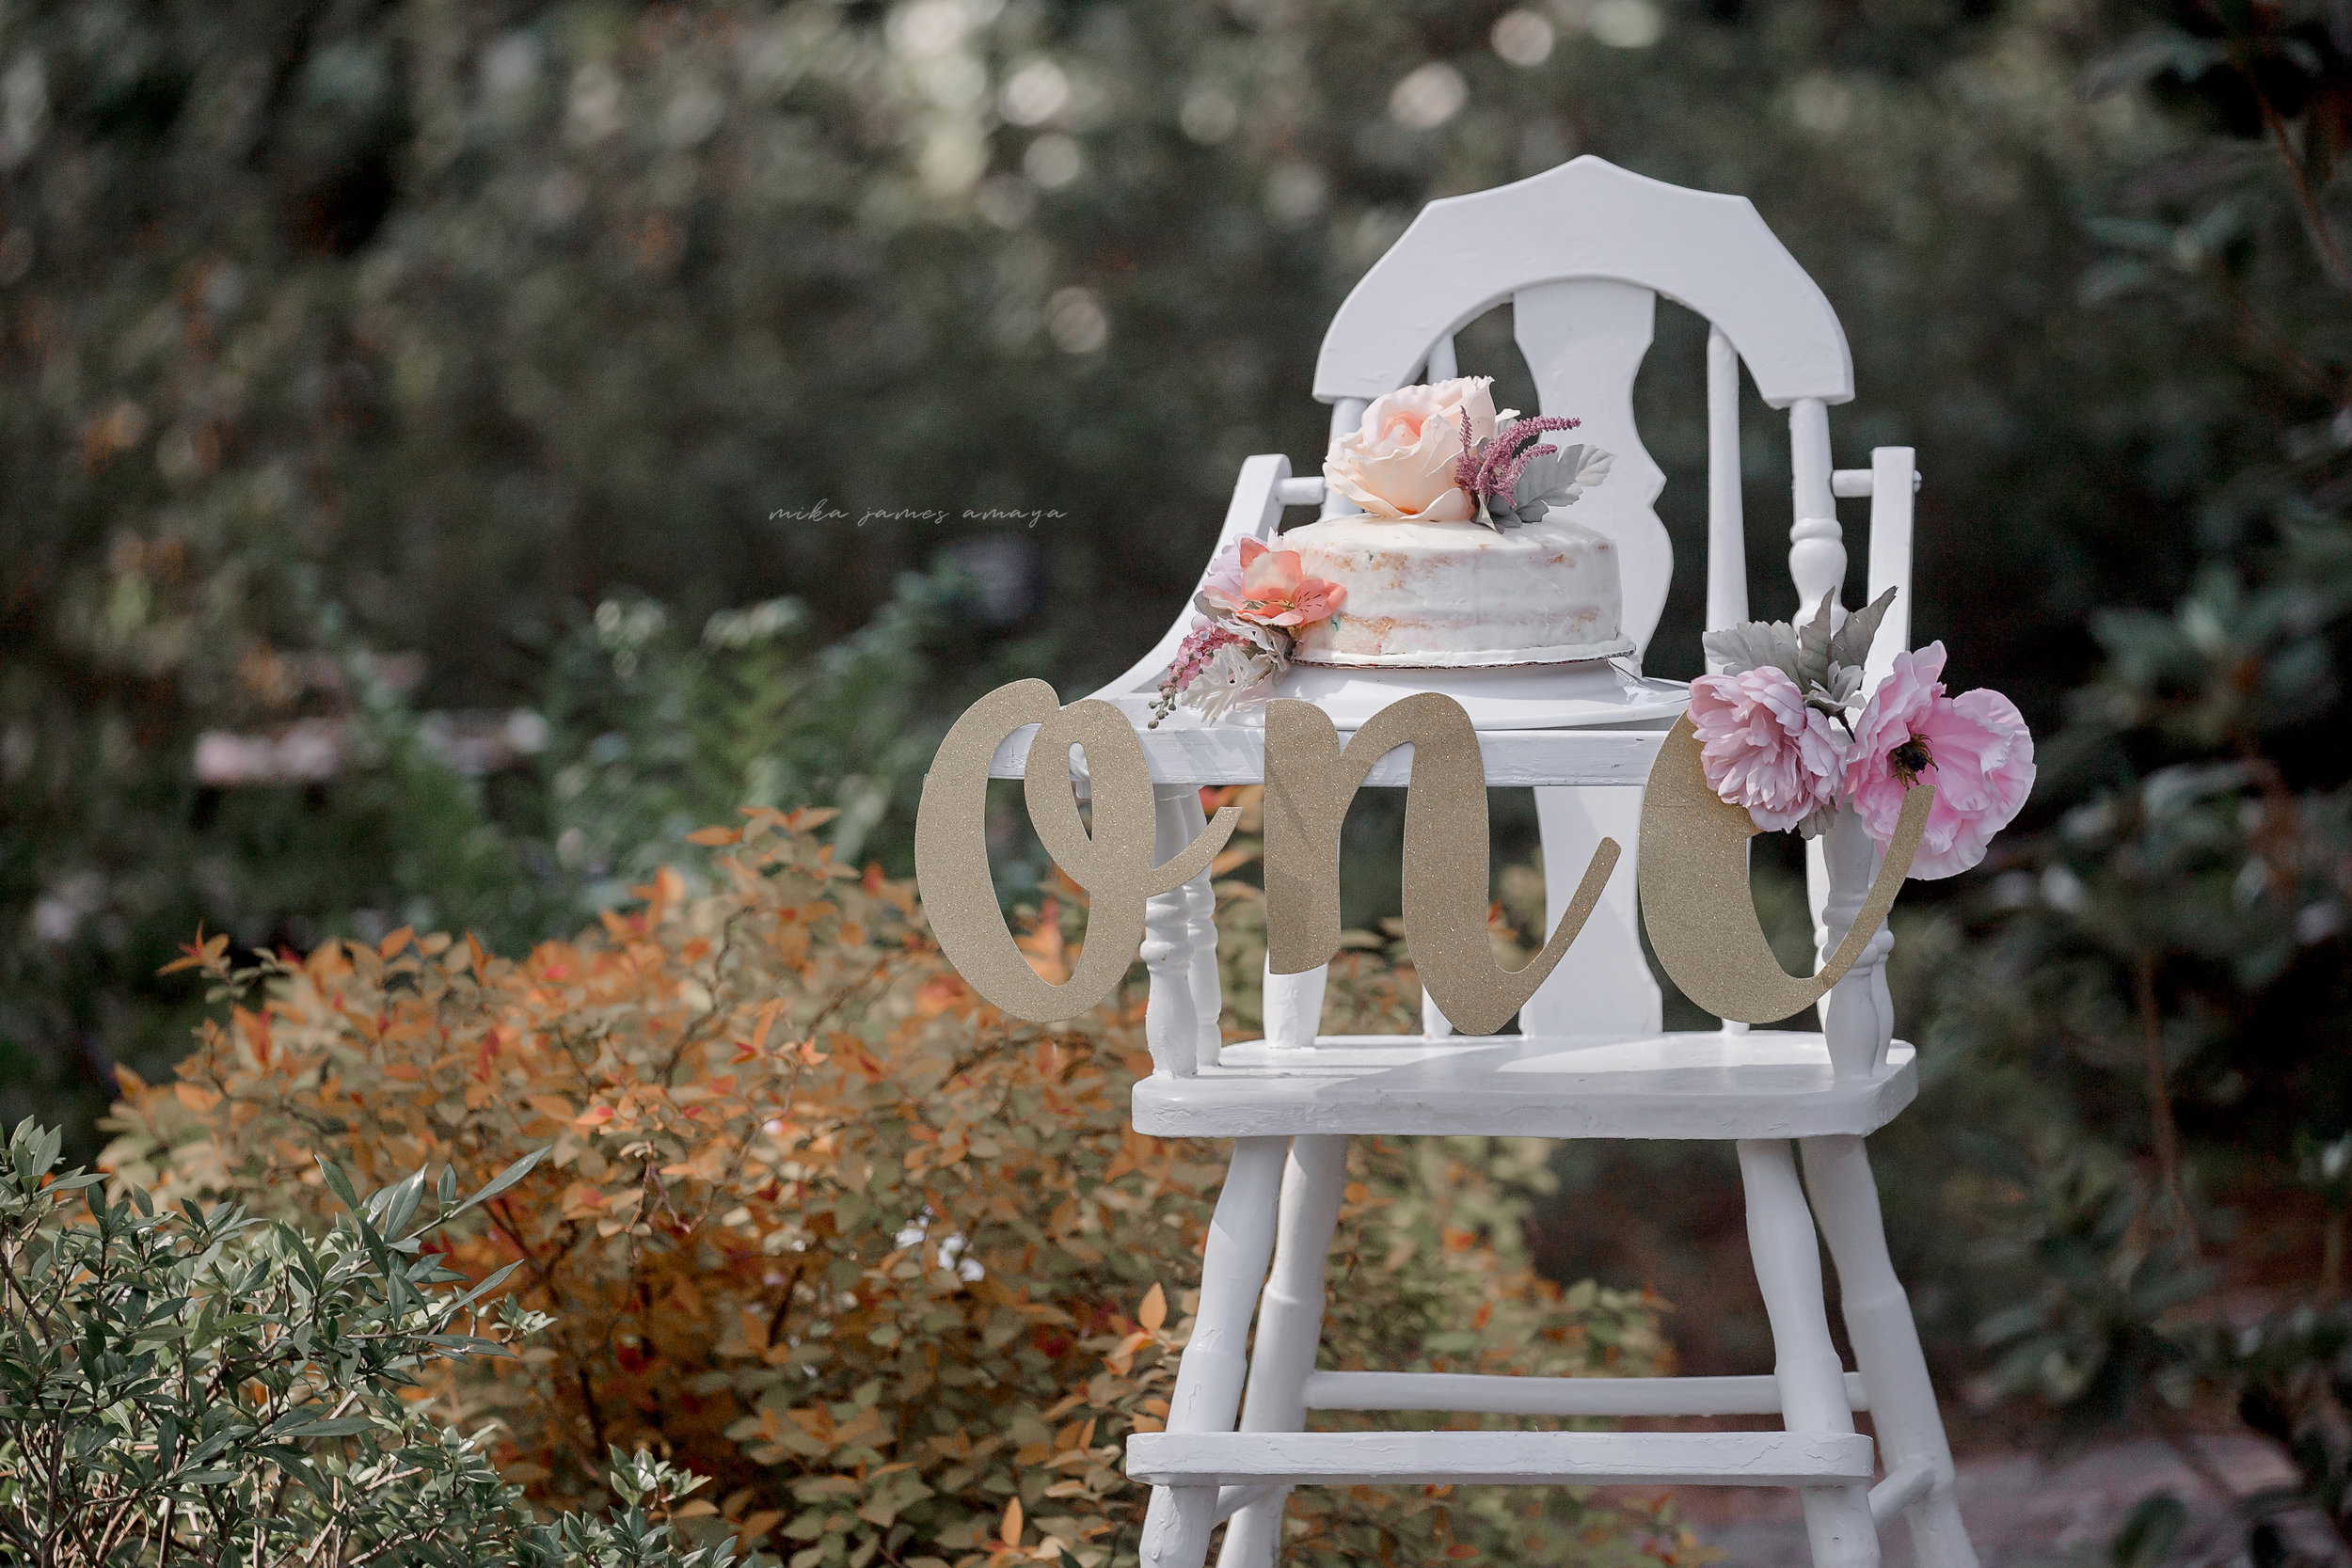 best+raleigh+nc+cake+smash+photographer+_mika+james+amaya+photography+_+raleigh+nc+maternity+photographer+_+raleigh+nc+family+photographer+_+raleigh+WRAL+AZALEA+GARDEN+raleigh+nc+outdoor+maternity+photographer_ Baby (1)